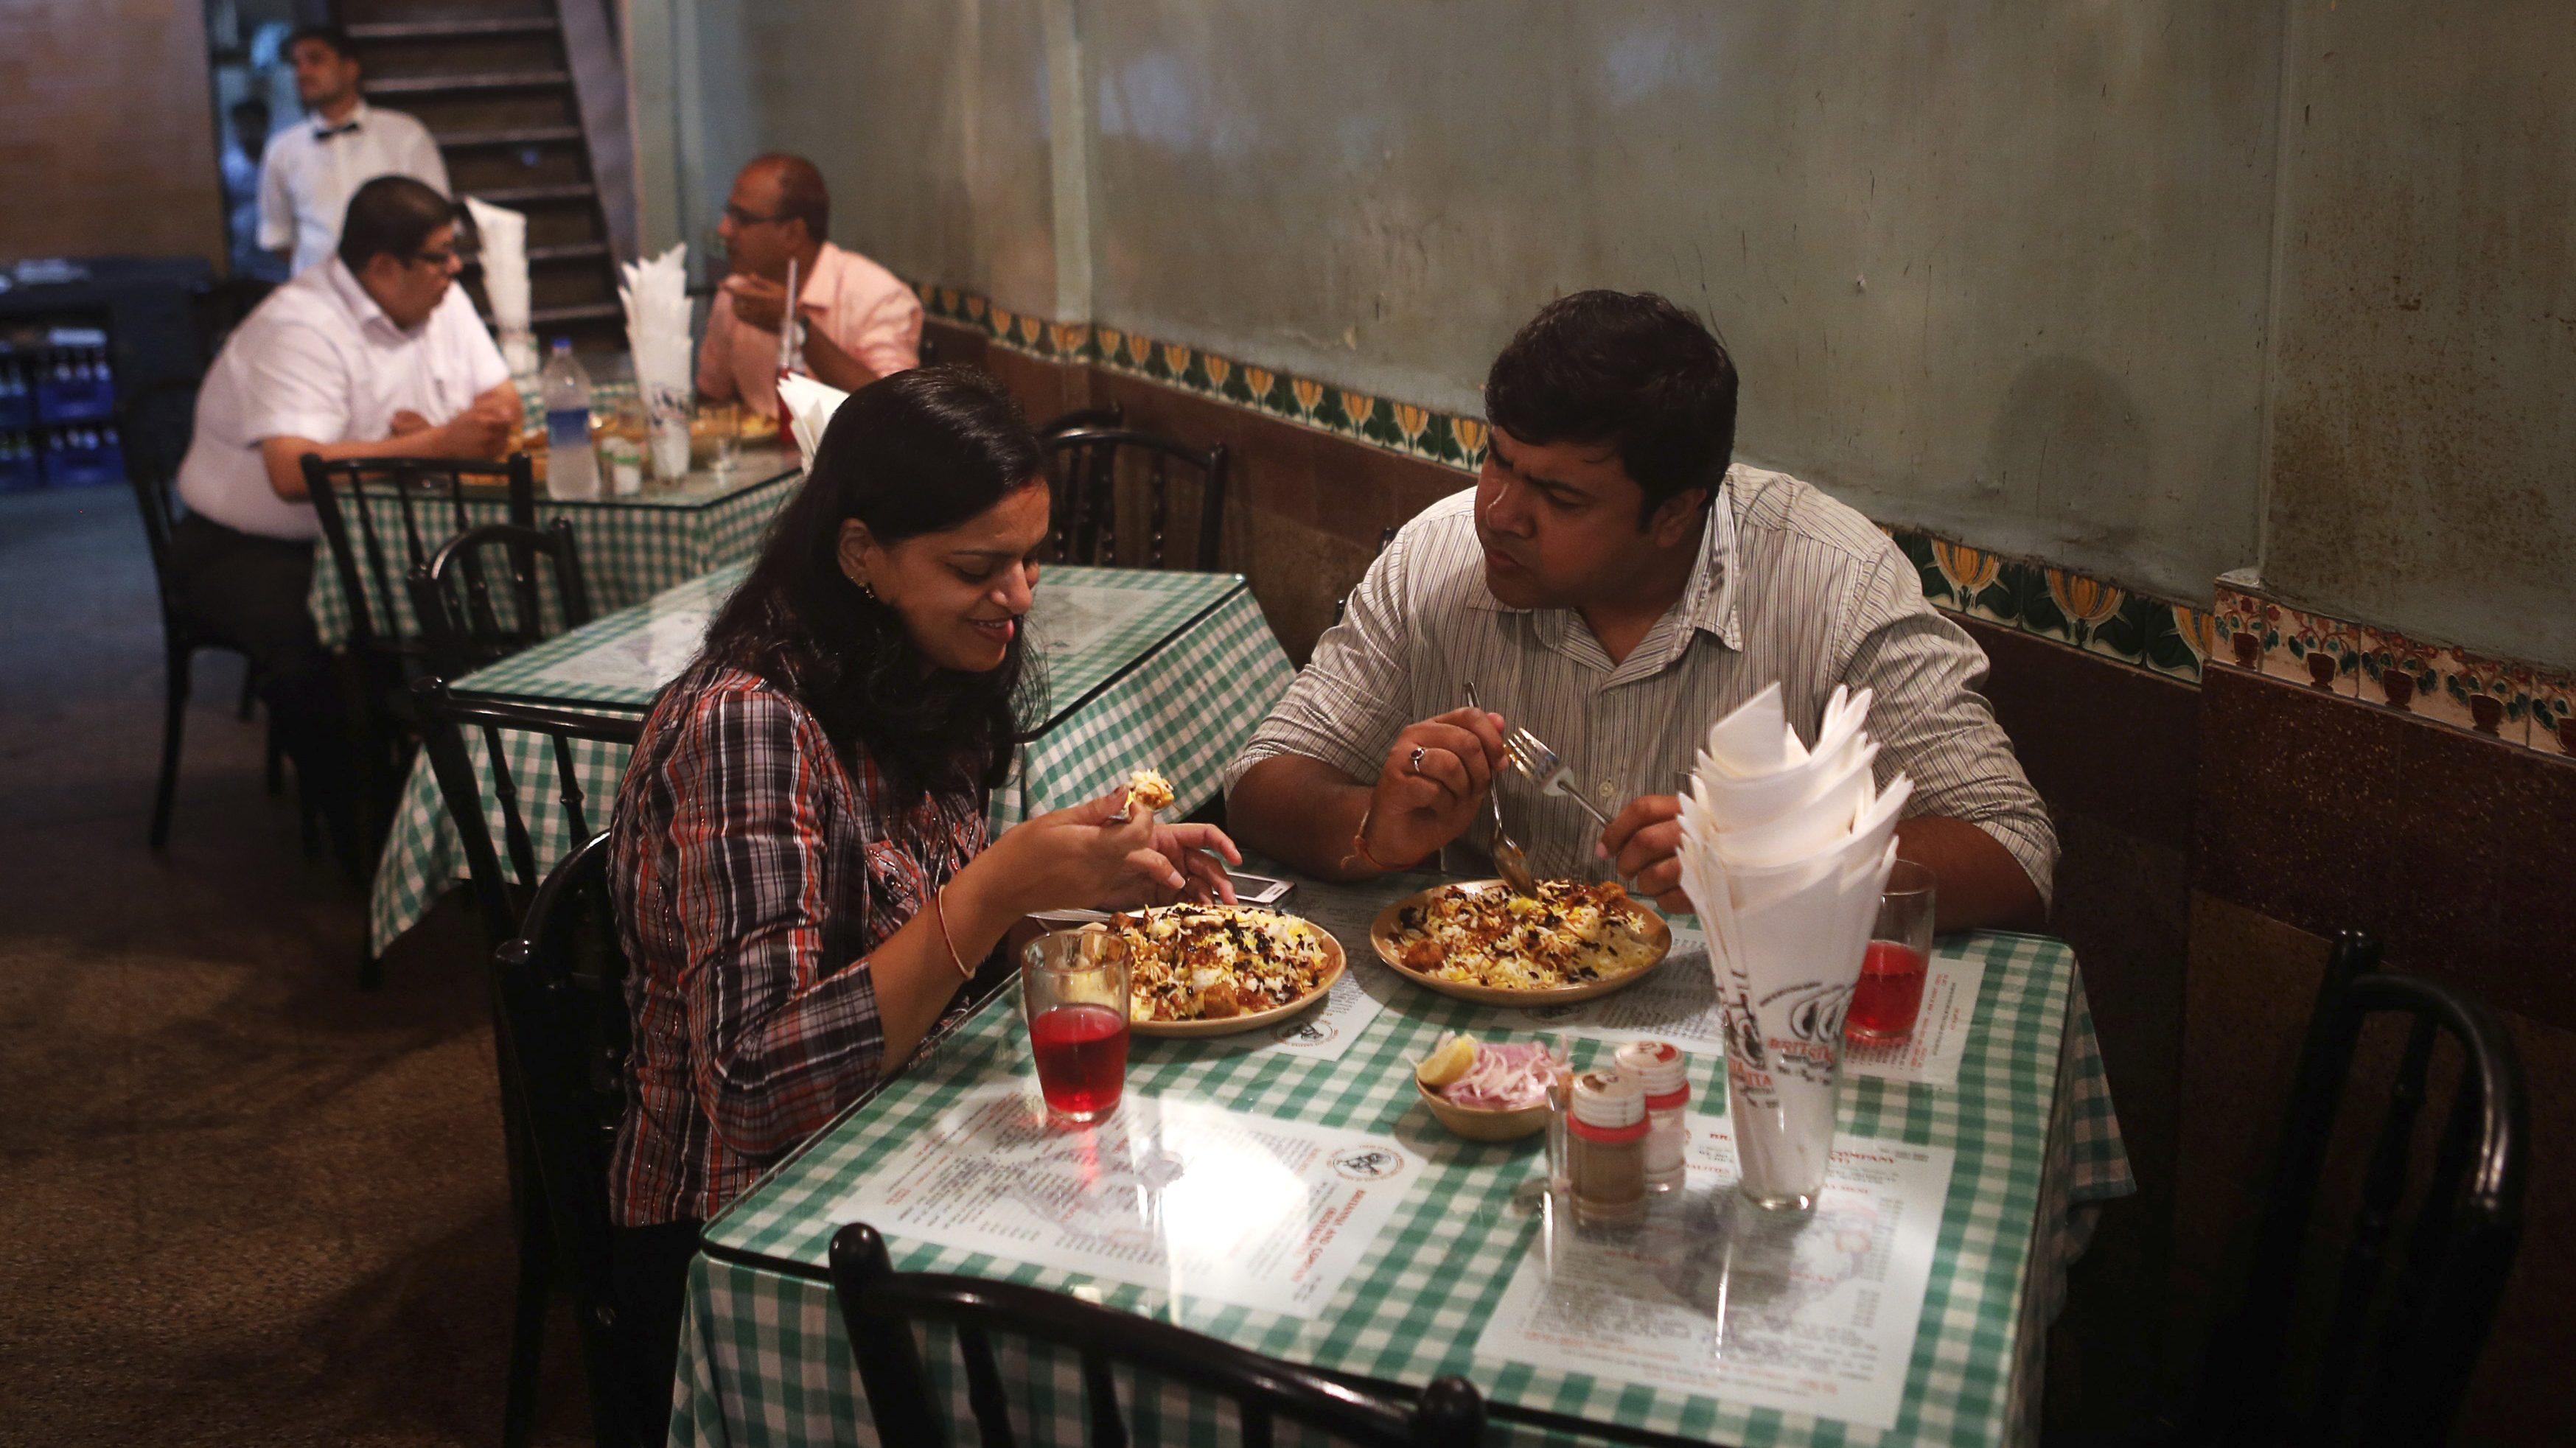 food-india-restaurant-millennial